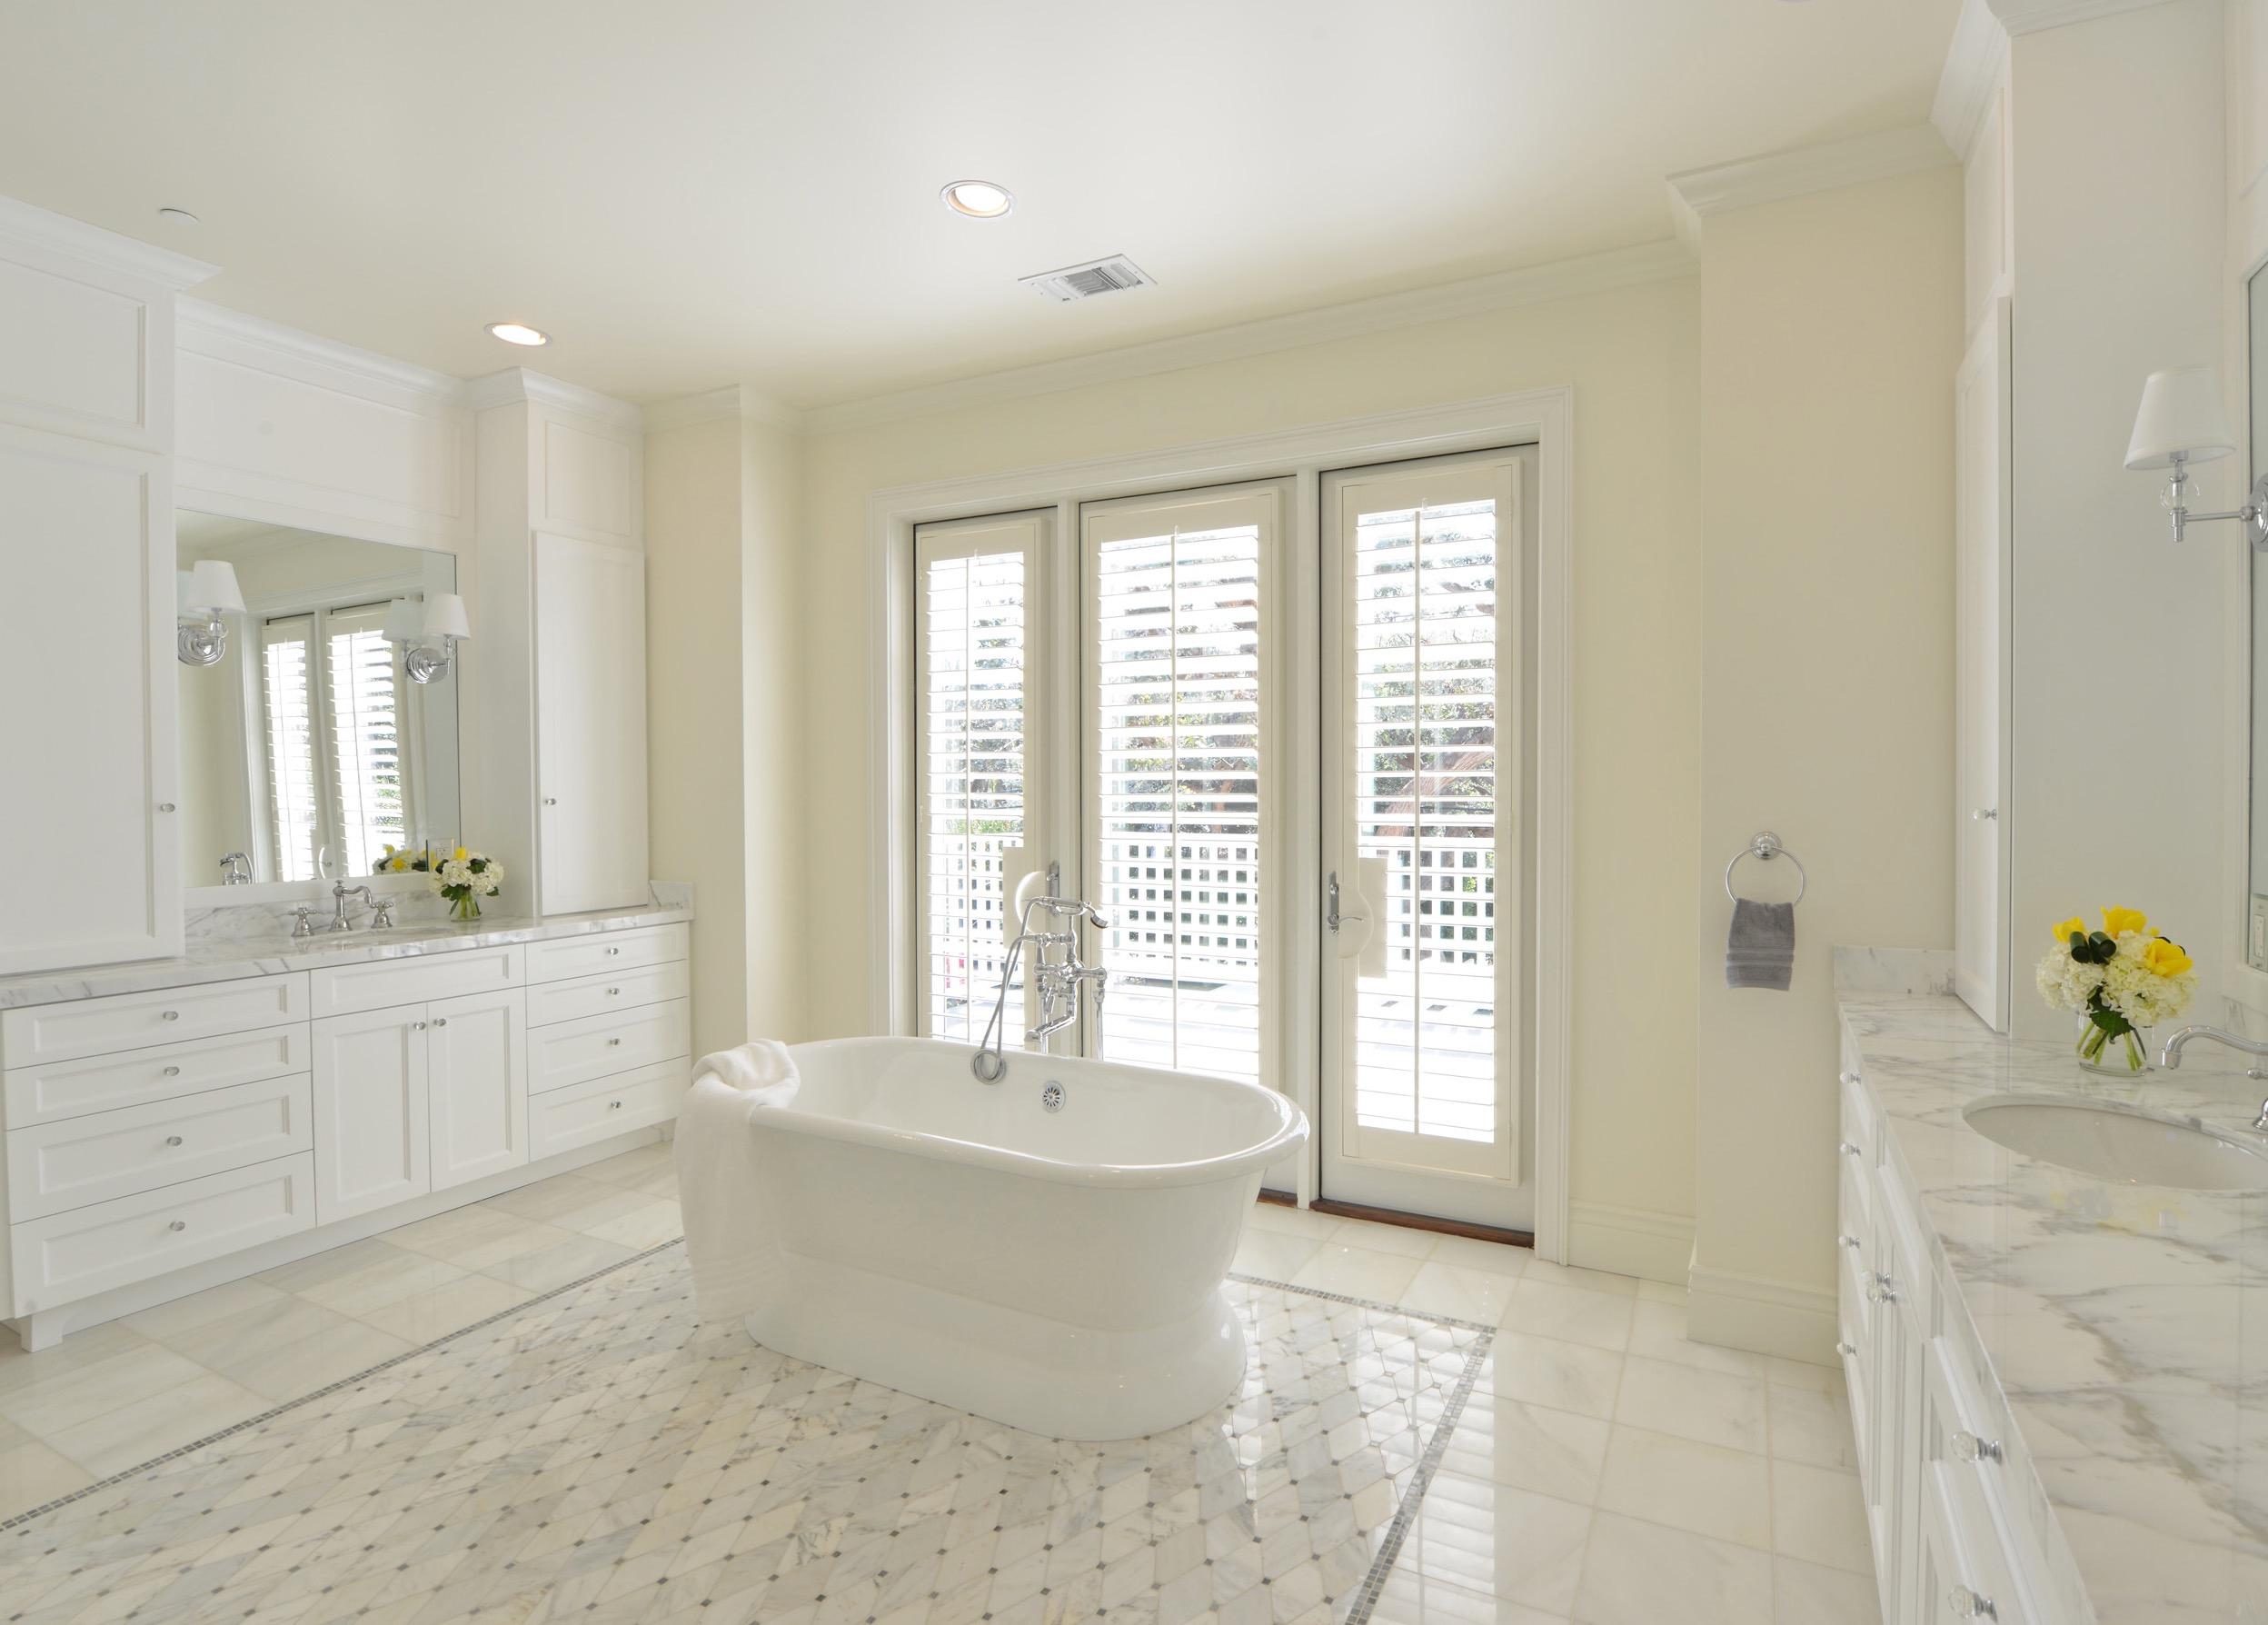 Best Kitchen Gallery: Classic Bathroom Interior Design In Elegant Look 15033 Bathroom Ideas of Classic Bathroom Design  on rachelxblog.com